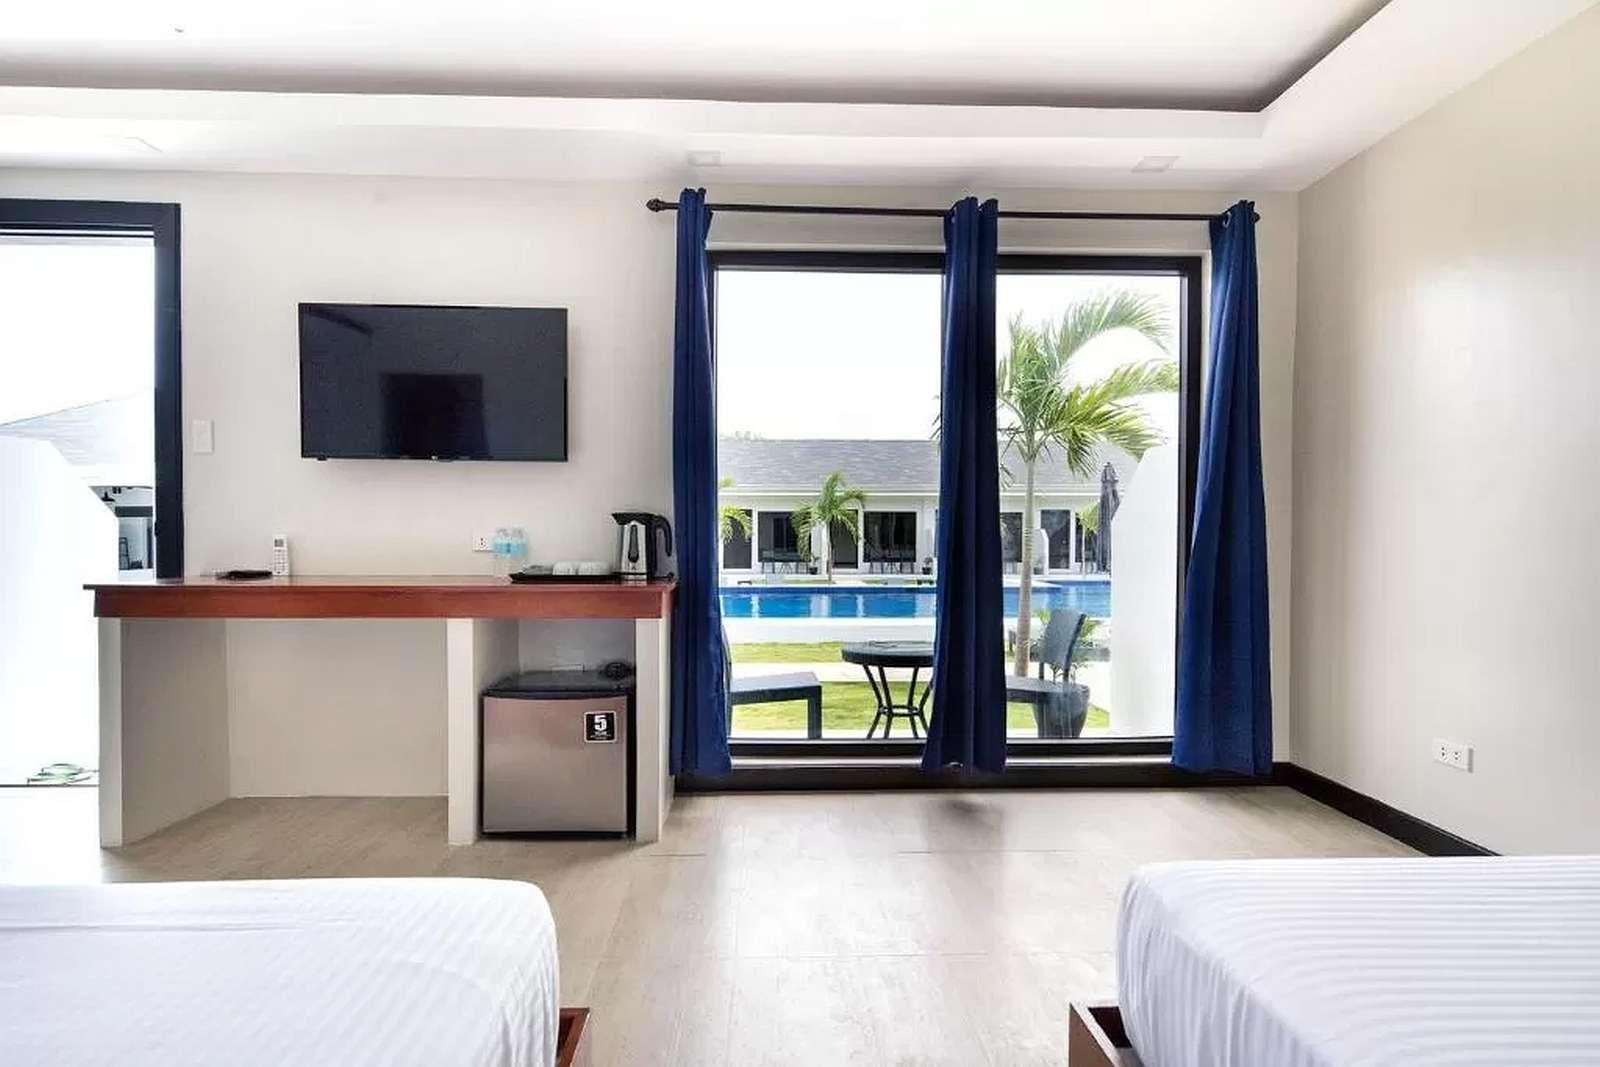 Ohana panglao resort bohol book here for discount rates (7)